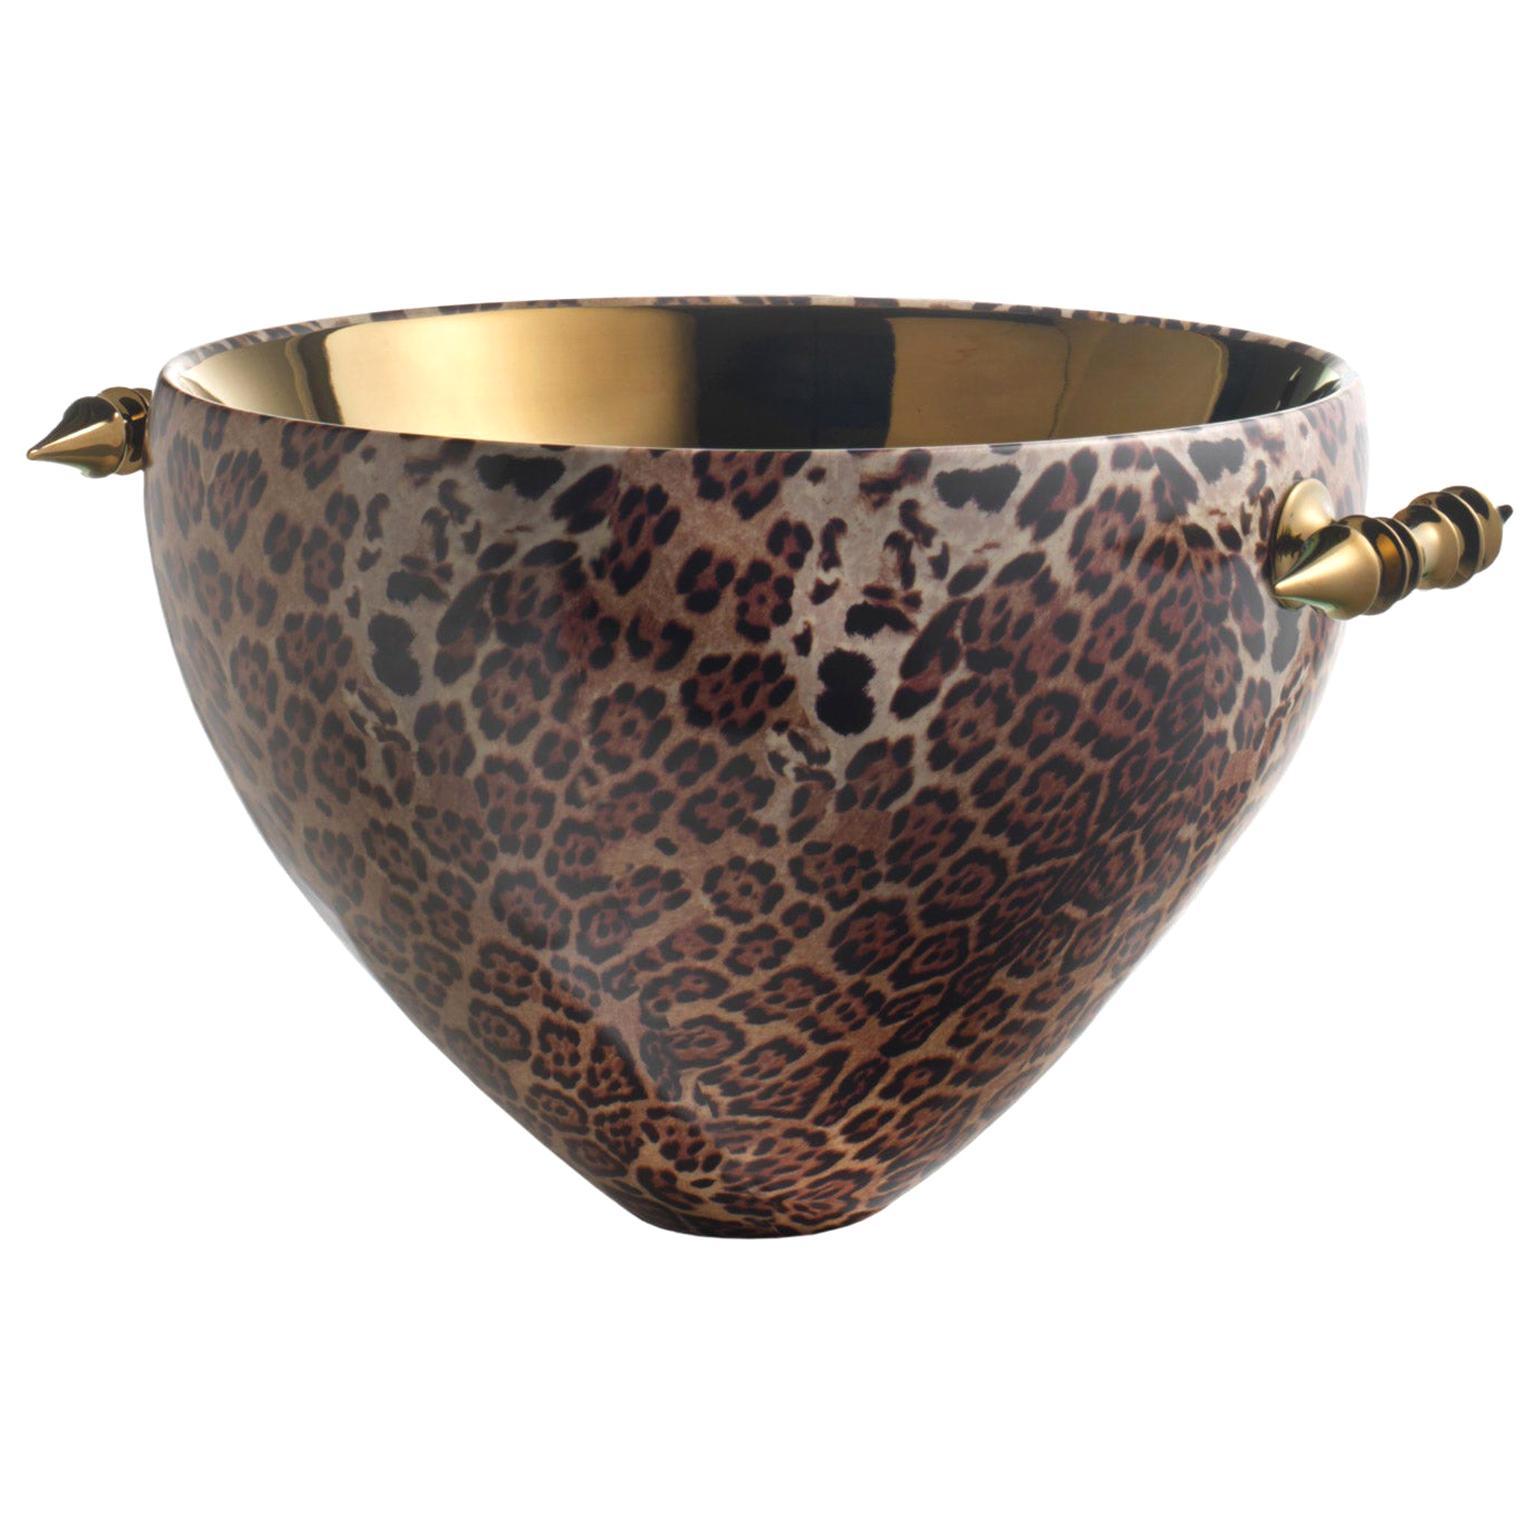 "Ceramic Bowl ""GABRIEL"" Leopard Decorated, Handcrafted in Bronze by Gabriella B."